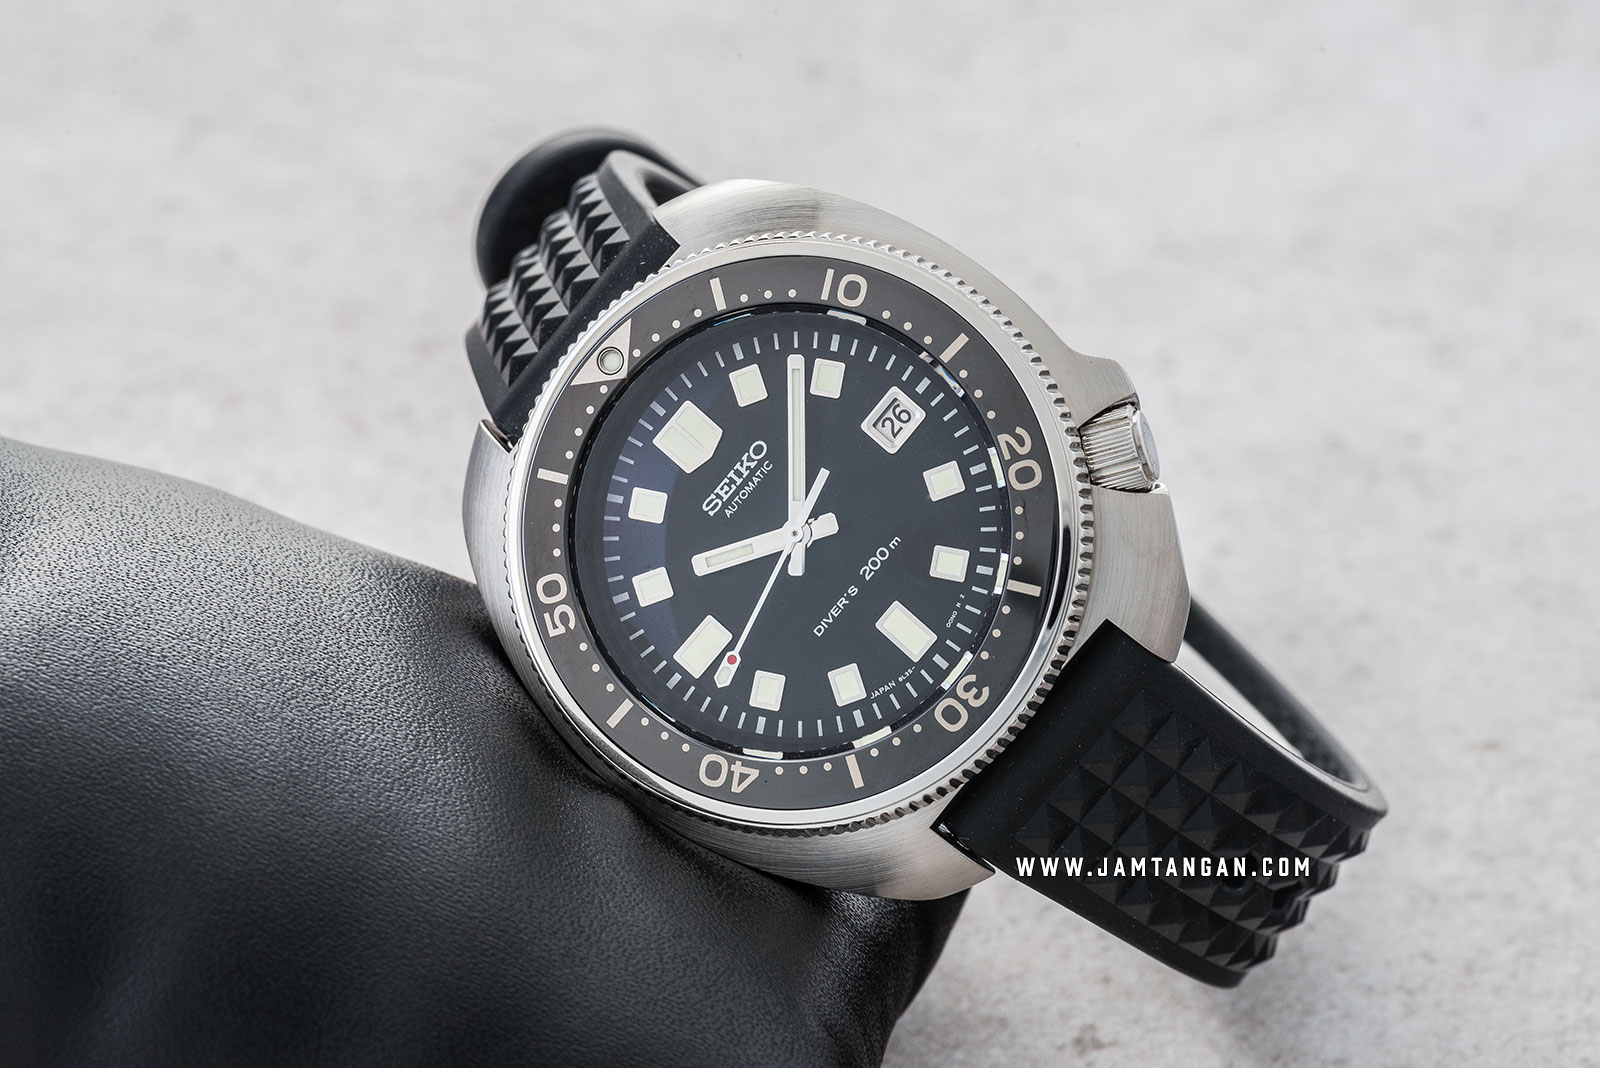 Seiko Prospex SLA033J1 Baselworld 2019 Divers 200M Limited Edition Machtwatch